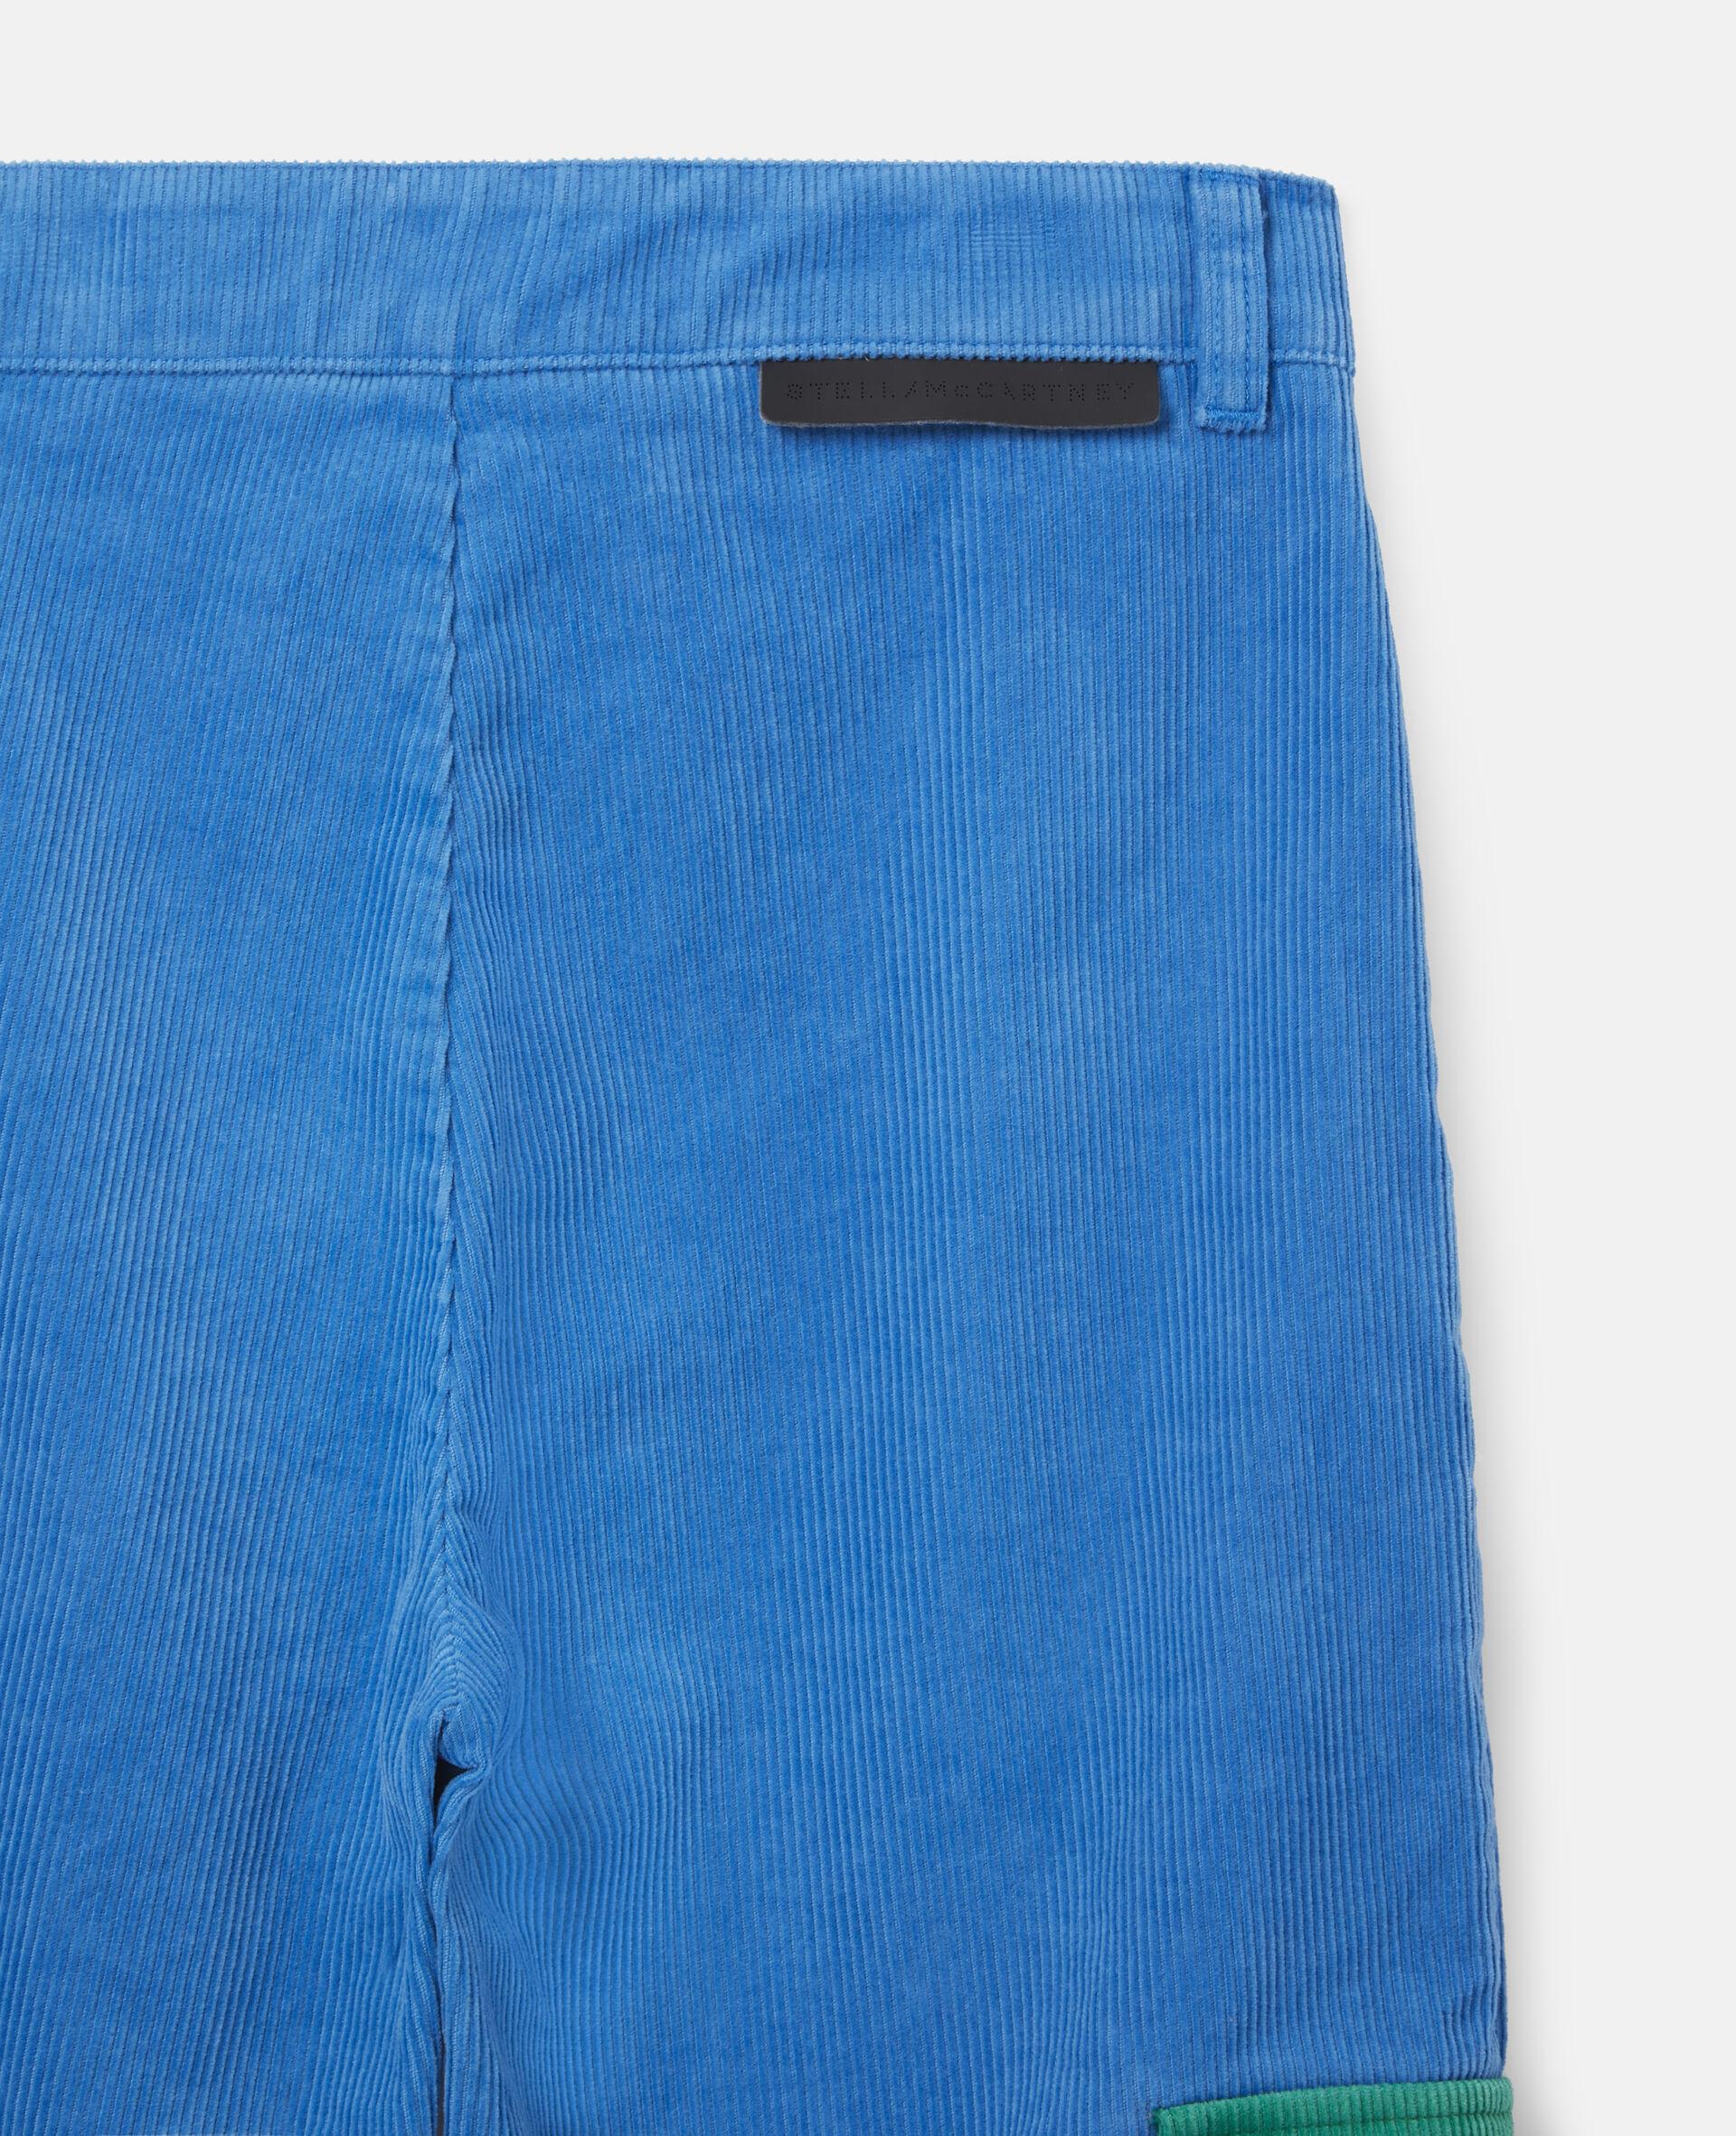 Cargo Corduroy Pants-Blue-large image number 2